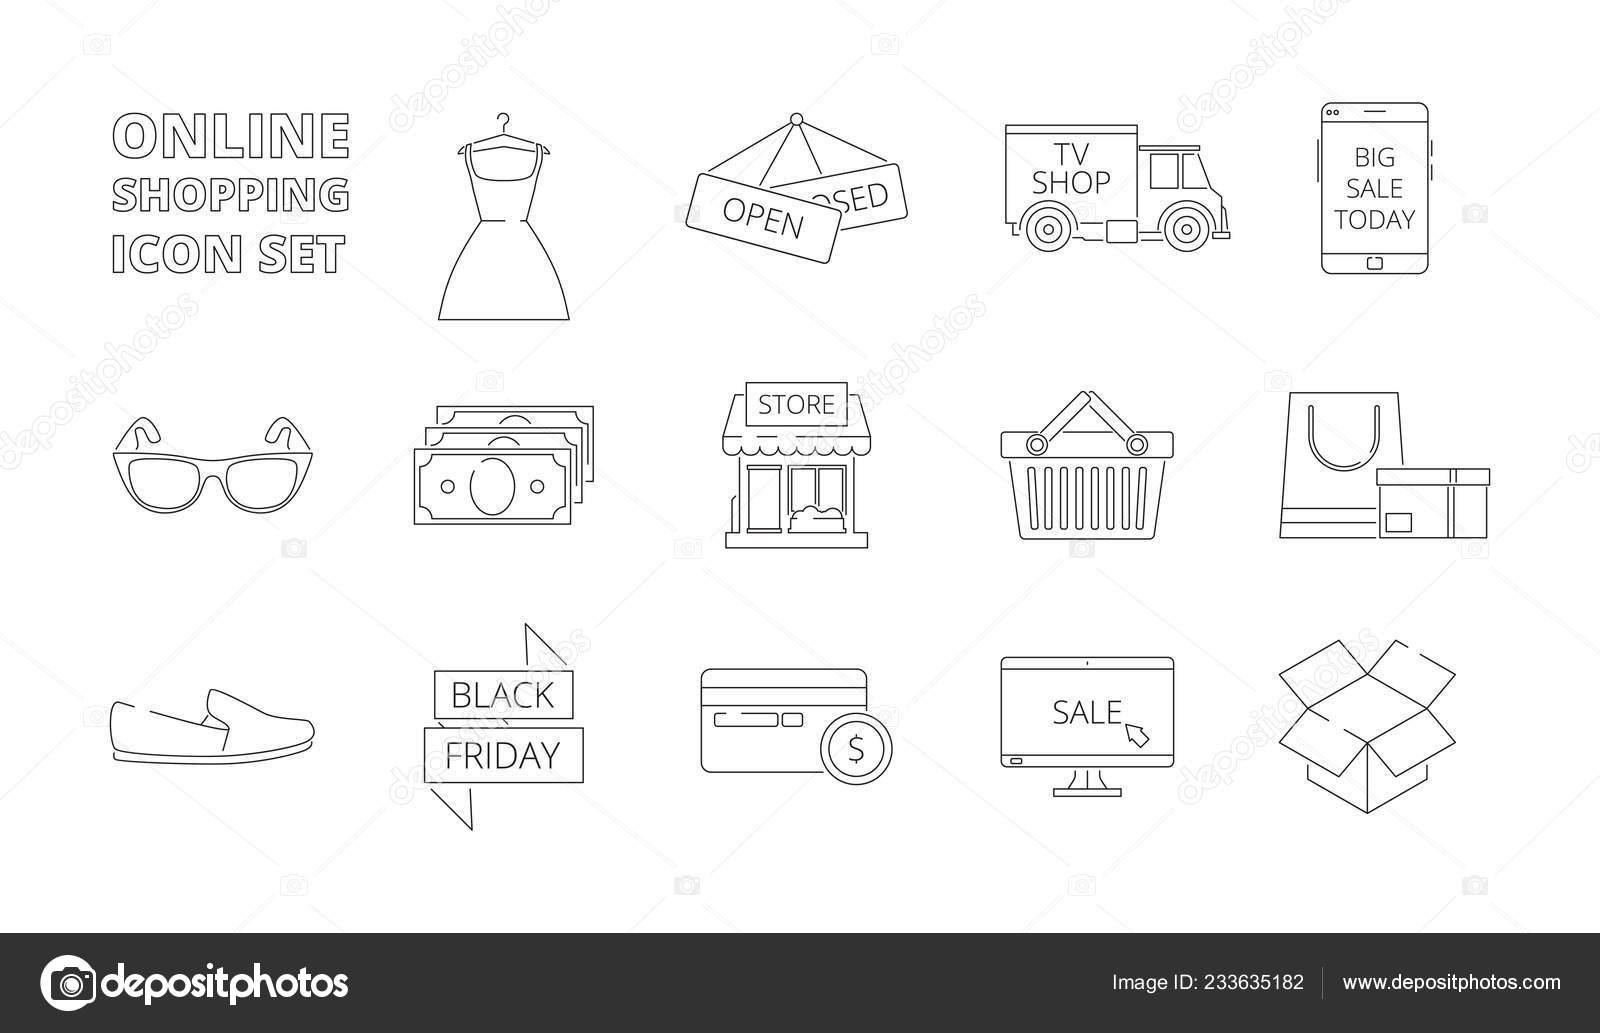 5abcd2ded87 Ηλεκτρονικό κατάστημα εικονίδια. Web online ψώνια λιανικής πώλησης  προϊόντων ηλεκτρονικής αγοράς smartphone pc πωλήσεις έκπτωση κάρτες χρήματα  ρούχα ...